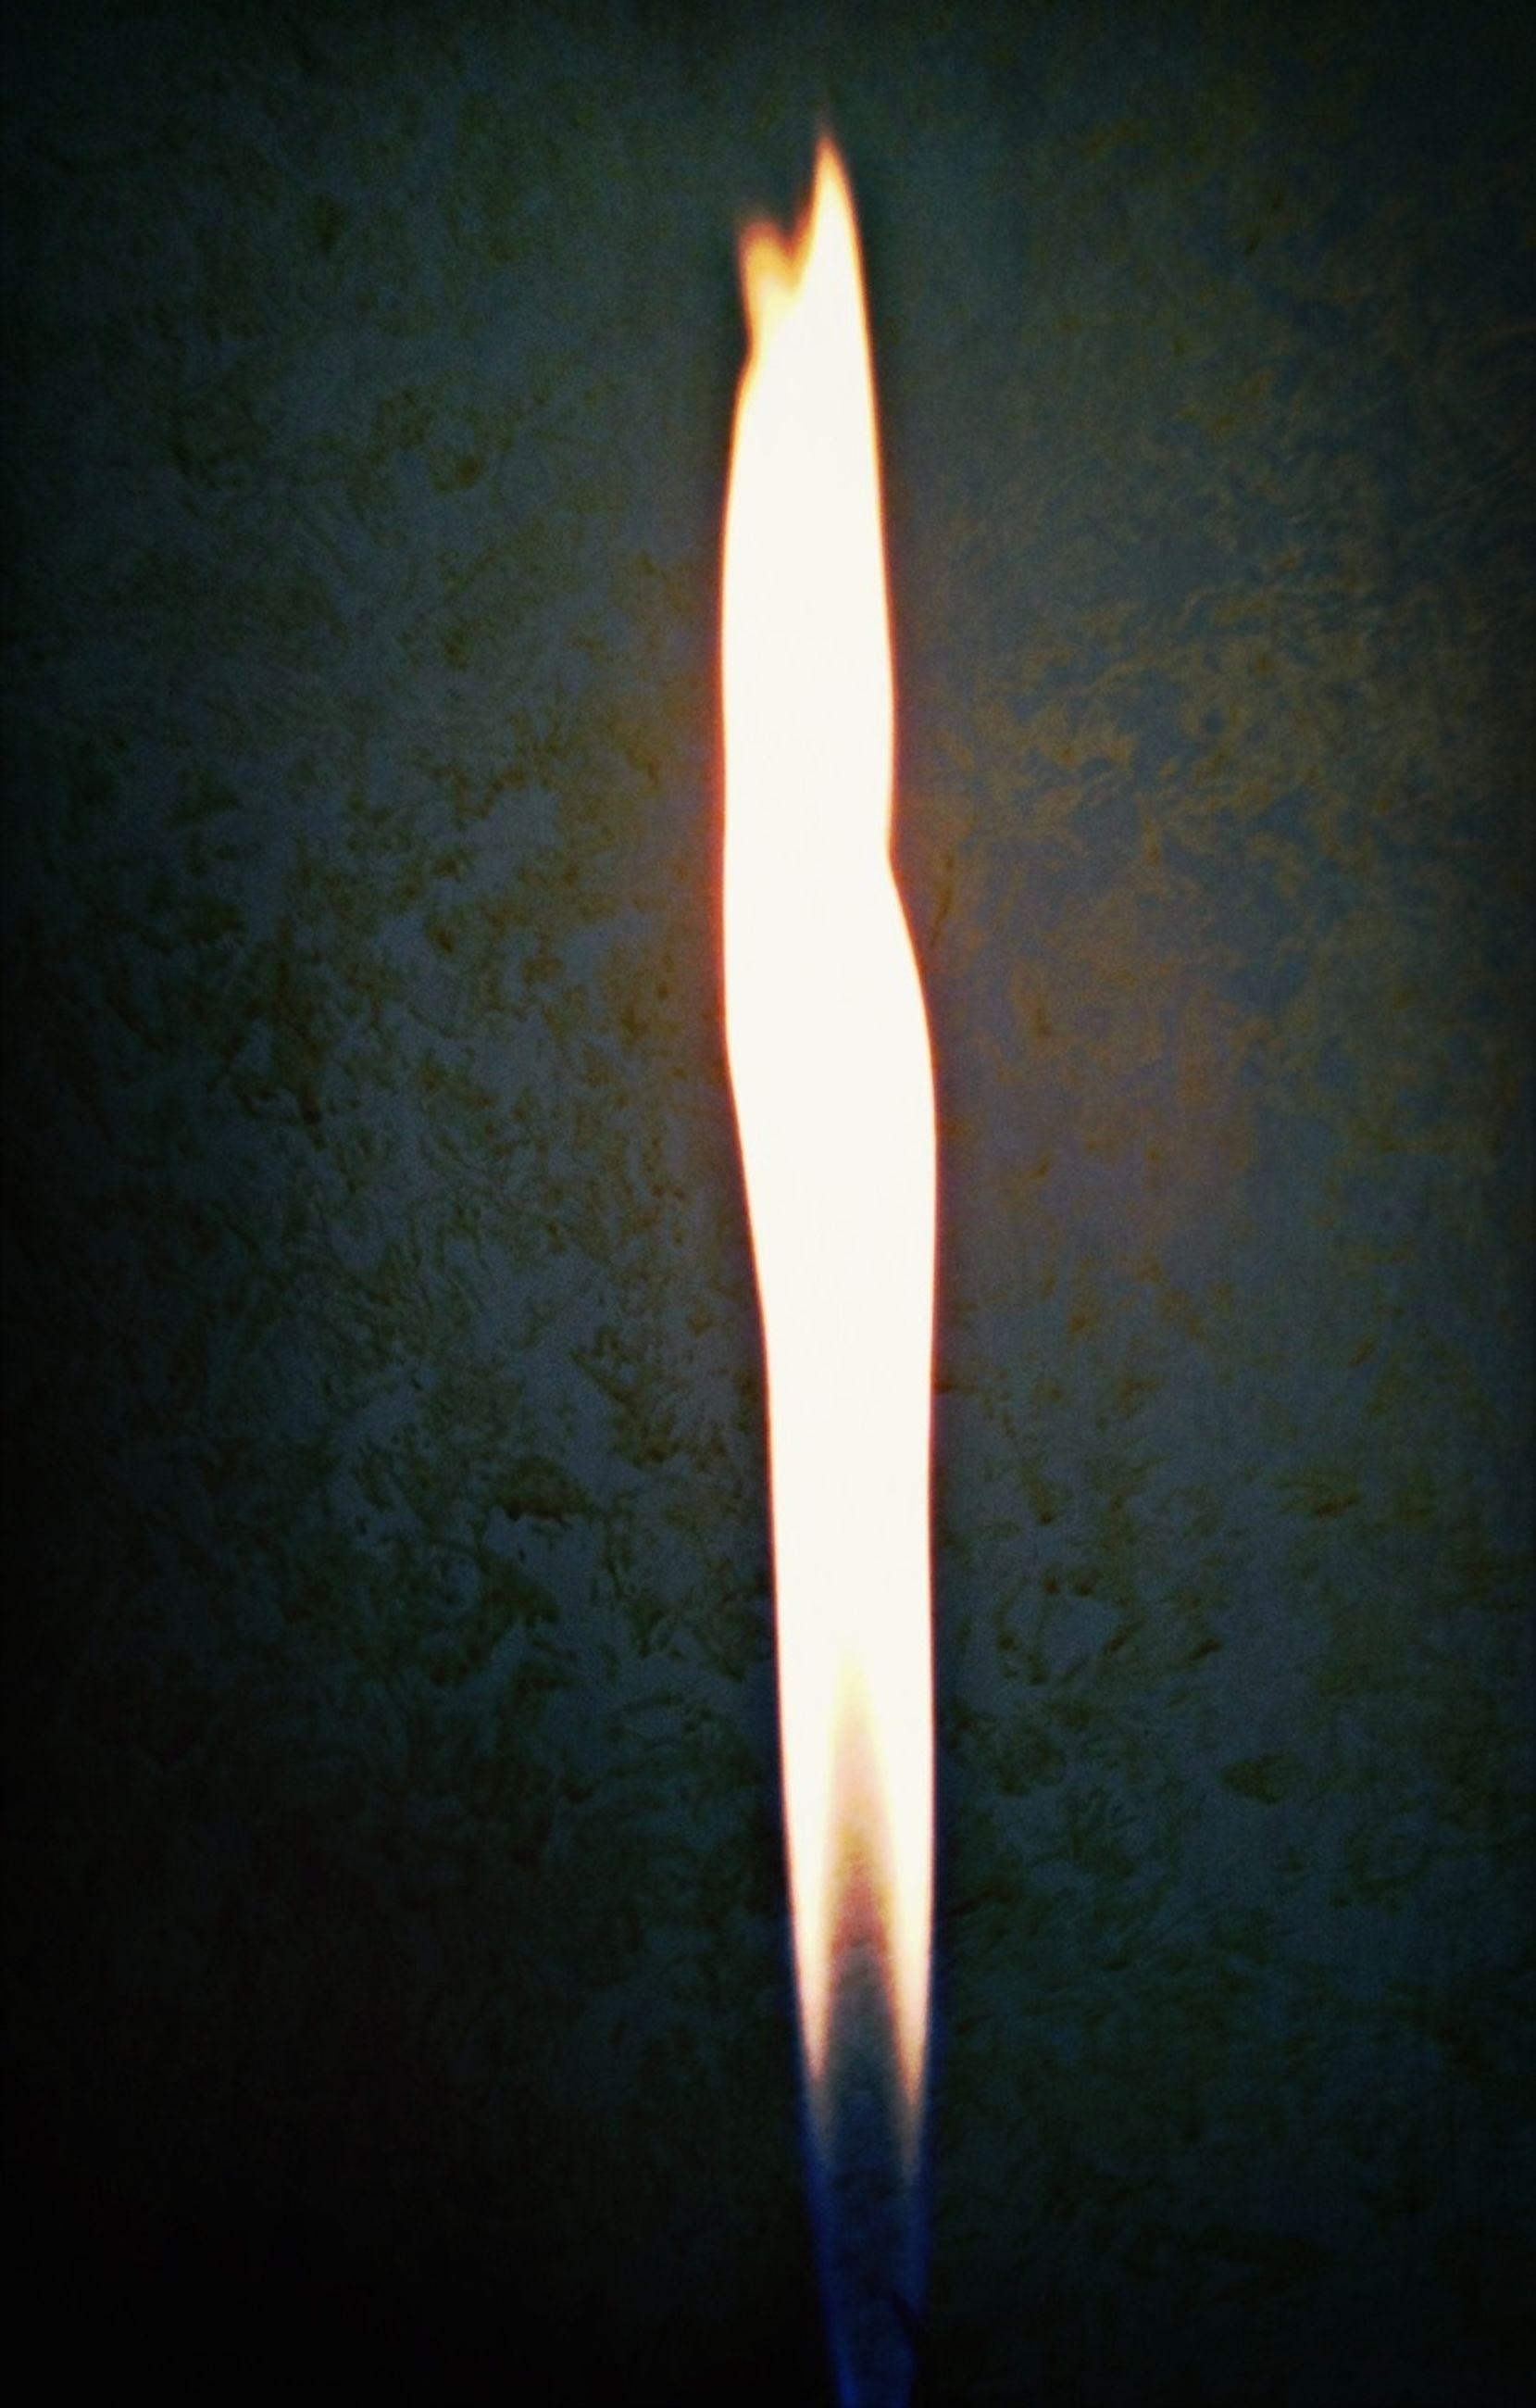 flame, burning, heat - temperature, fire - natural phenomenon, glowing, black background, close-up, indoors, studio shot, fire, night, dark, candle, copy space, heat, no people, lit, orange color, light - natural phenomenon, bonfire